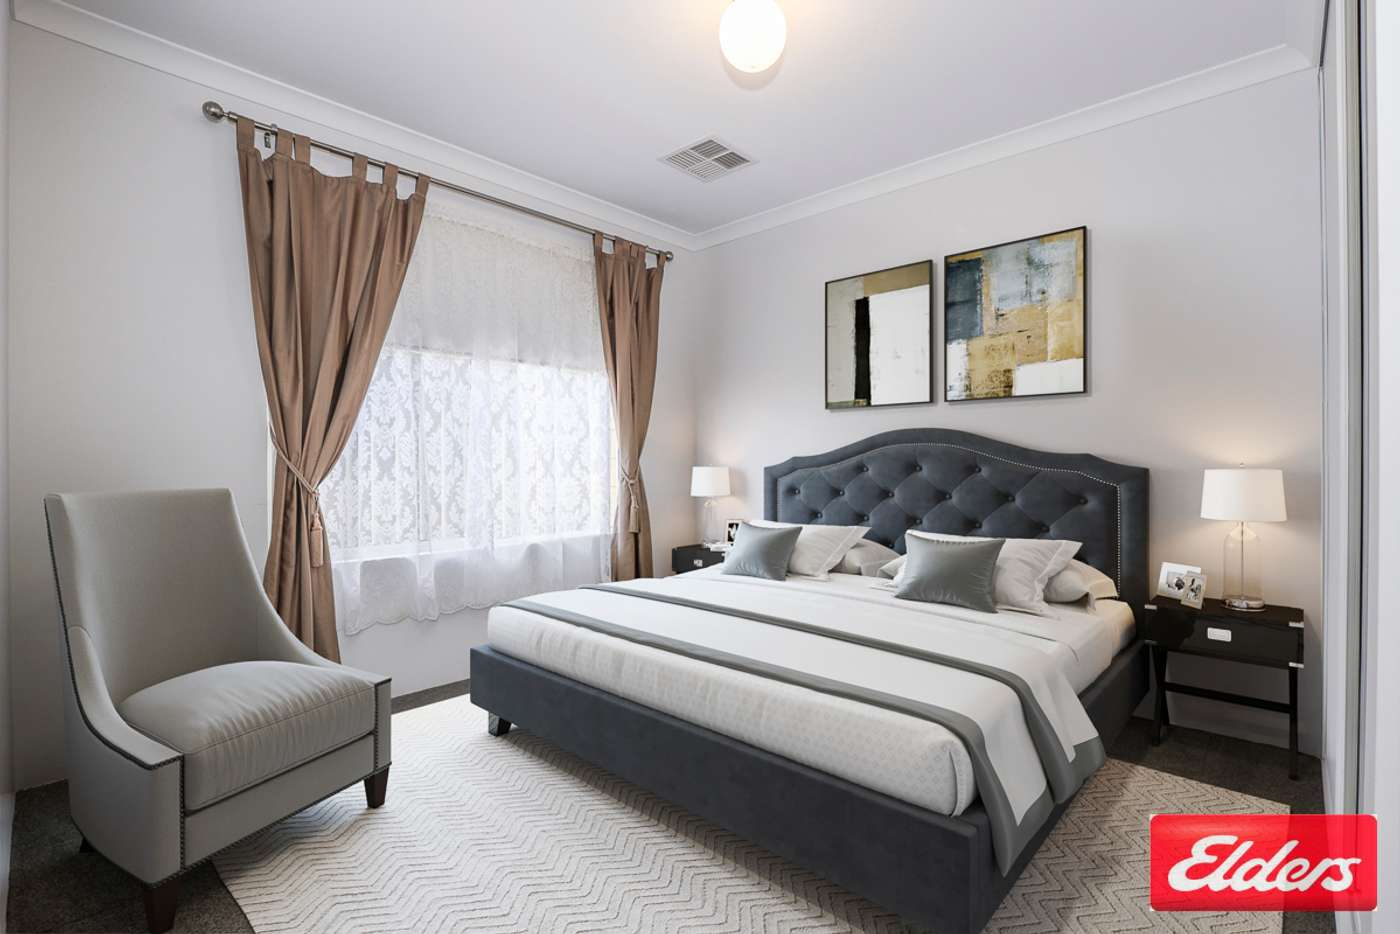 Sixth view of Homely house listing, 19 CHESHAM RISE, Alkimos WA 6038